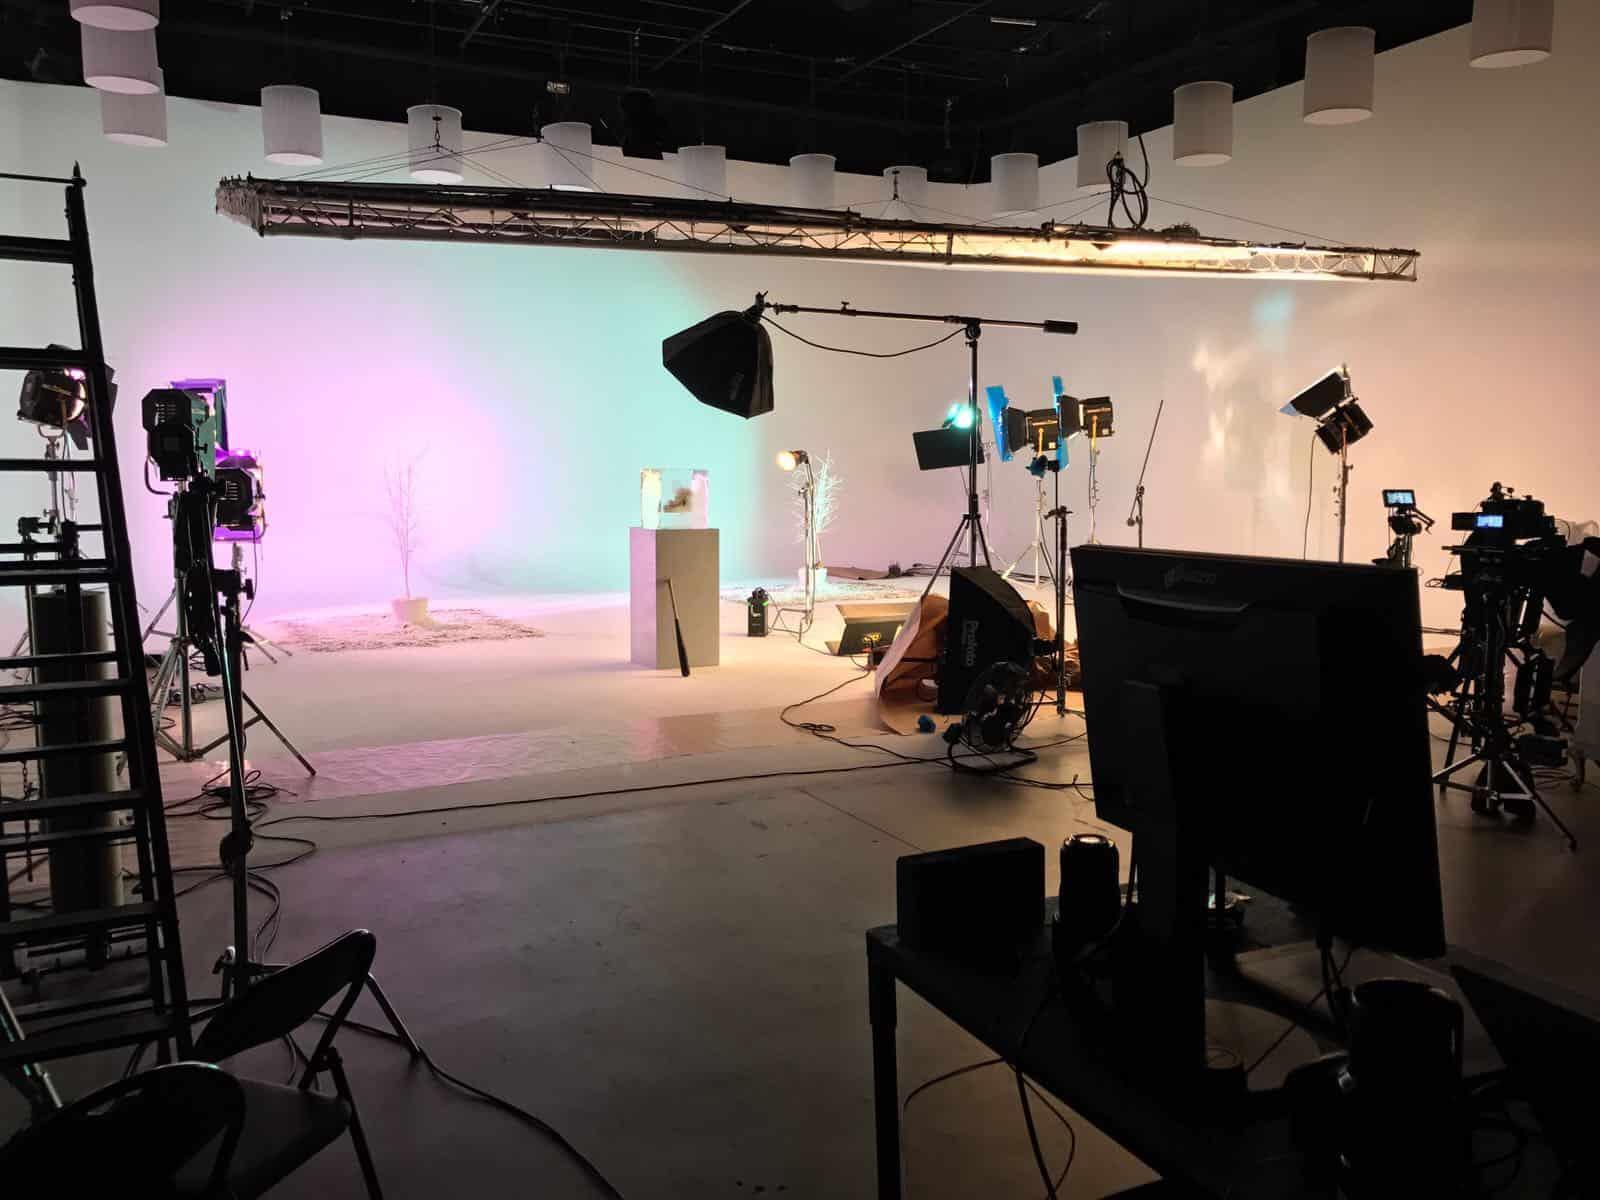 camera and studio hire - Madrid - Malaga - Seville - Cadiz - Bilbao - Pamplona - Barcelona - Lisbon - camaleon rental